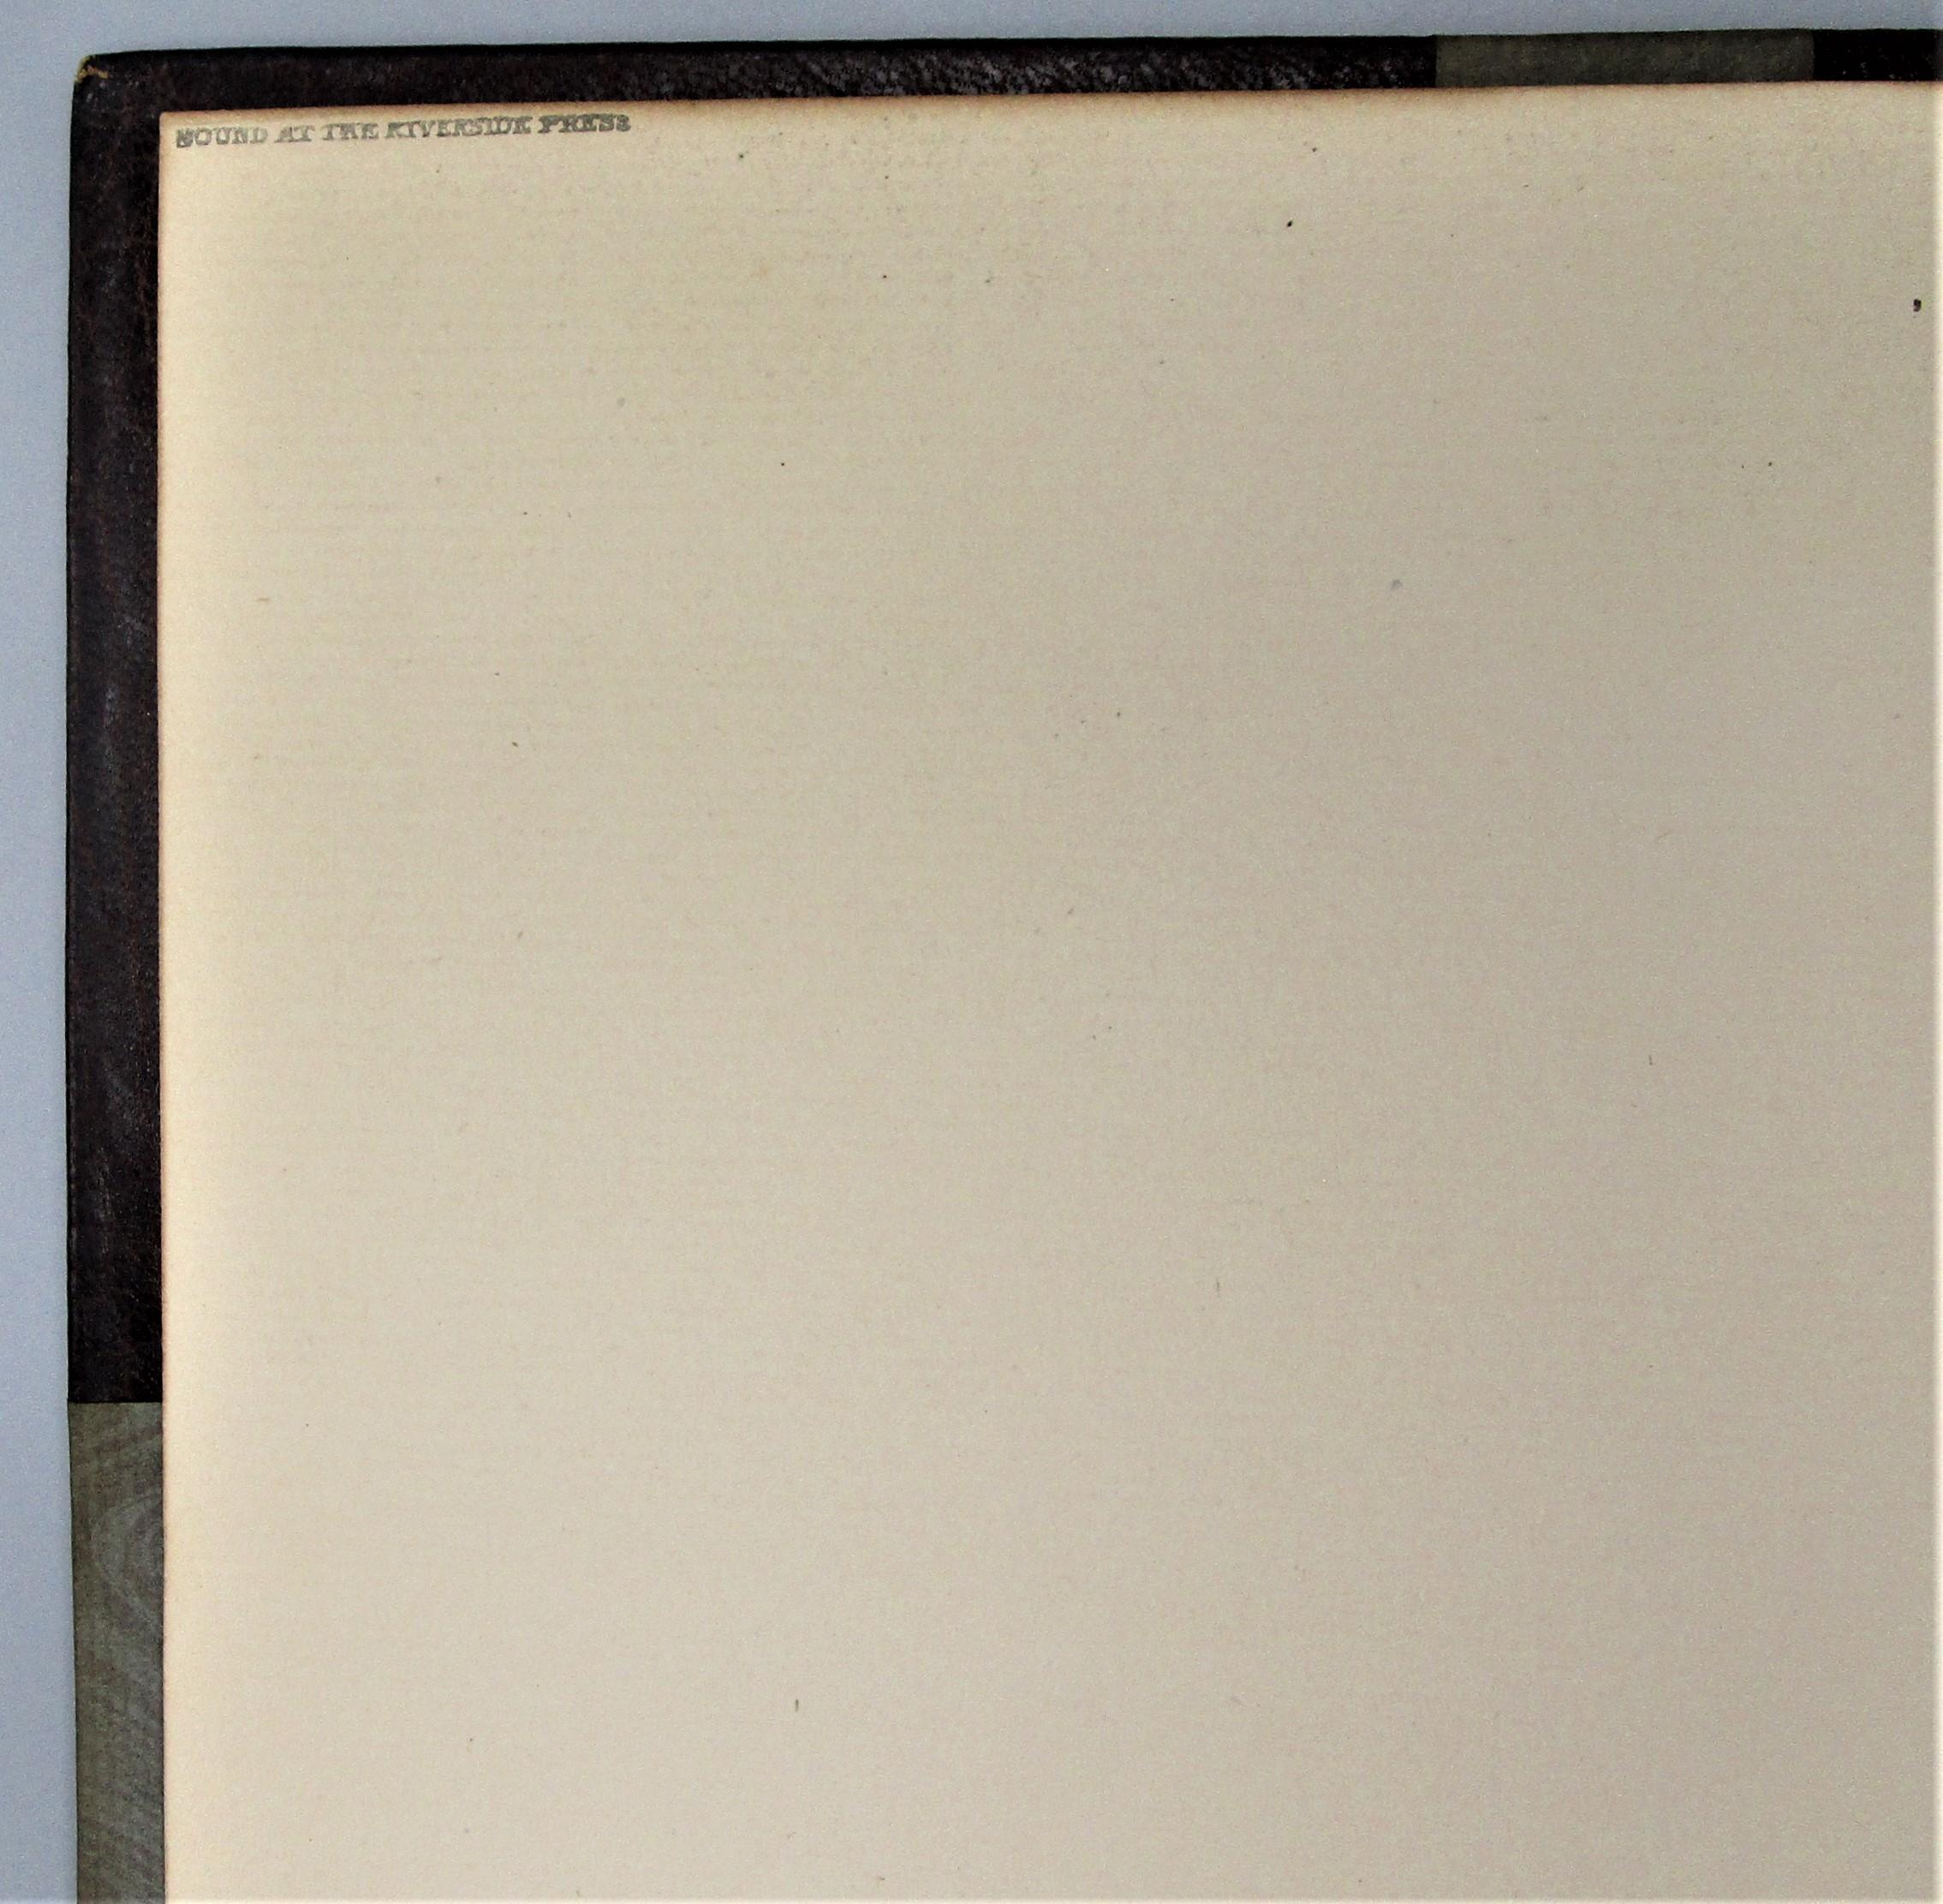 THE AENEID OF VIRGIL, tr by C.P. Cranch - 1906 [Ltd Ed 2 Vols]